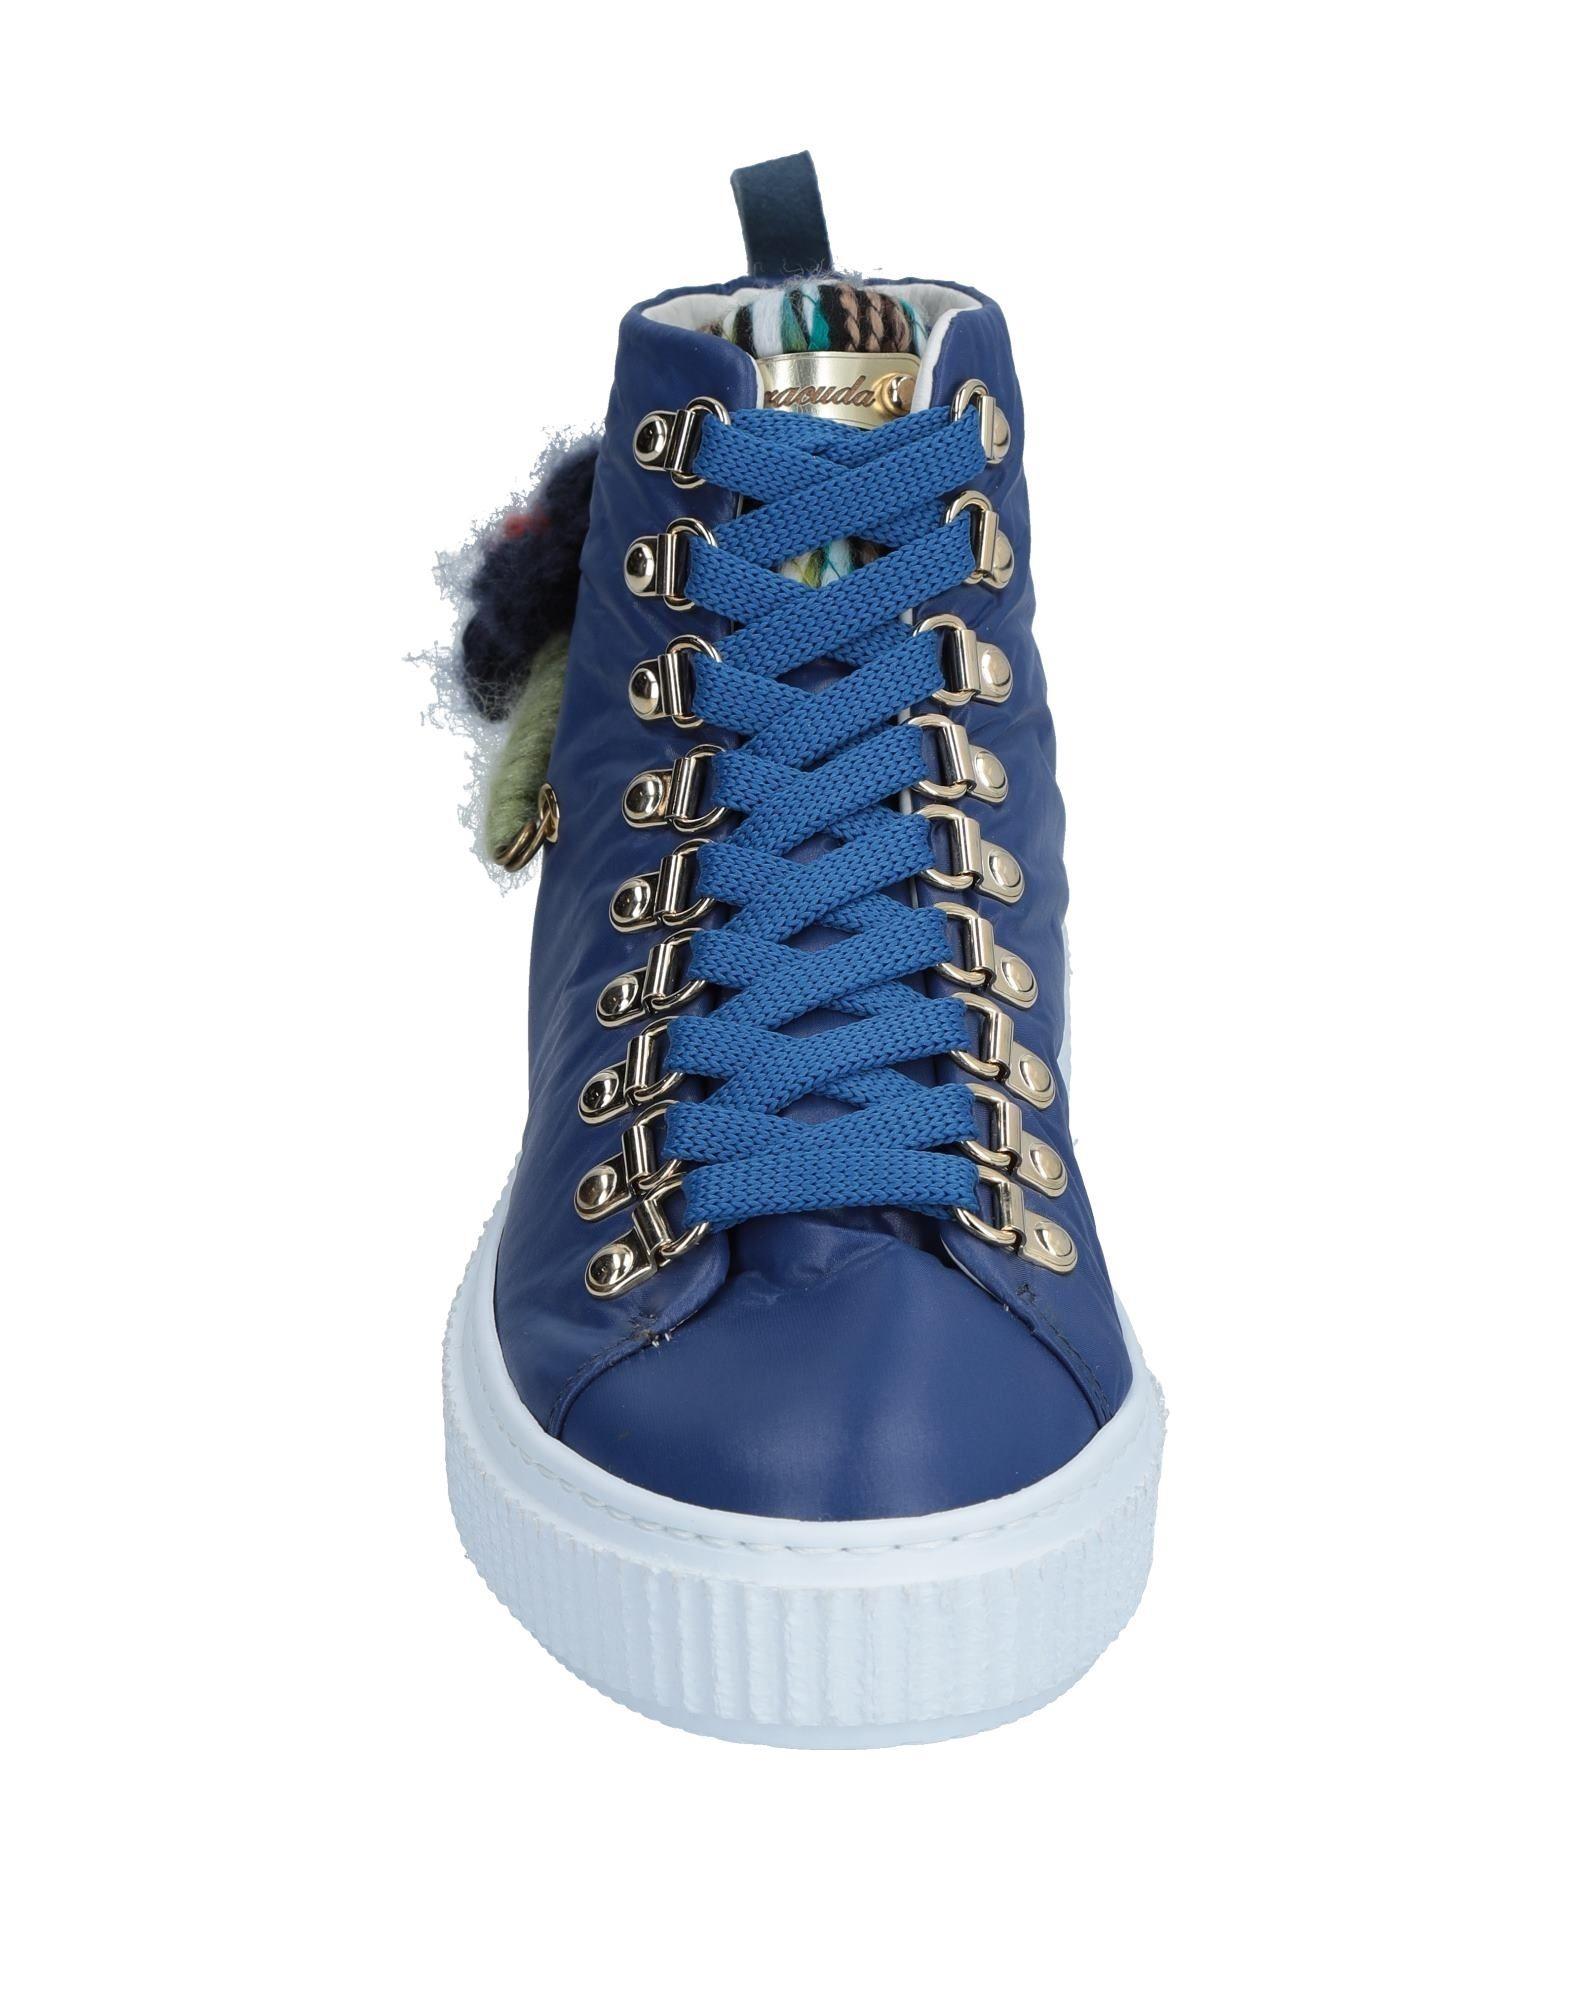 Stilvolle Barracuda billige Schuhe Barracuda Stilvolle Sneakers Damen  11536173QE 4ece1e